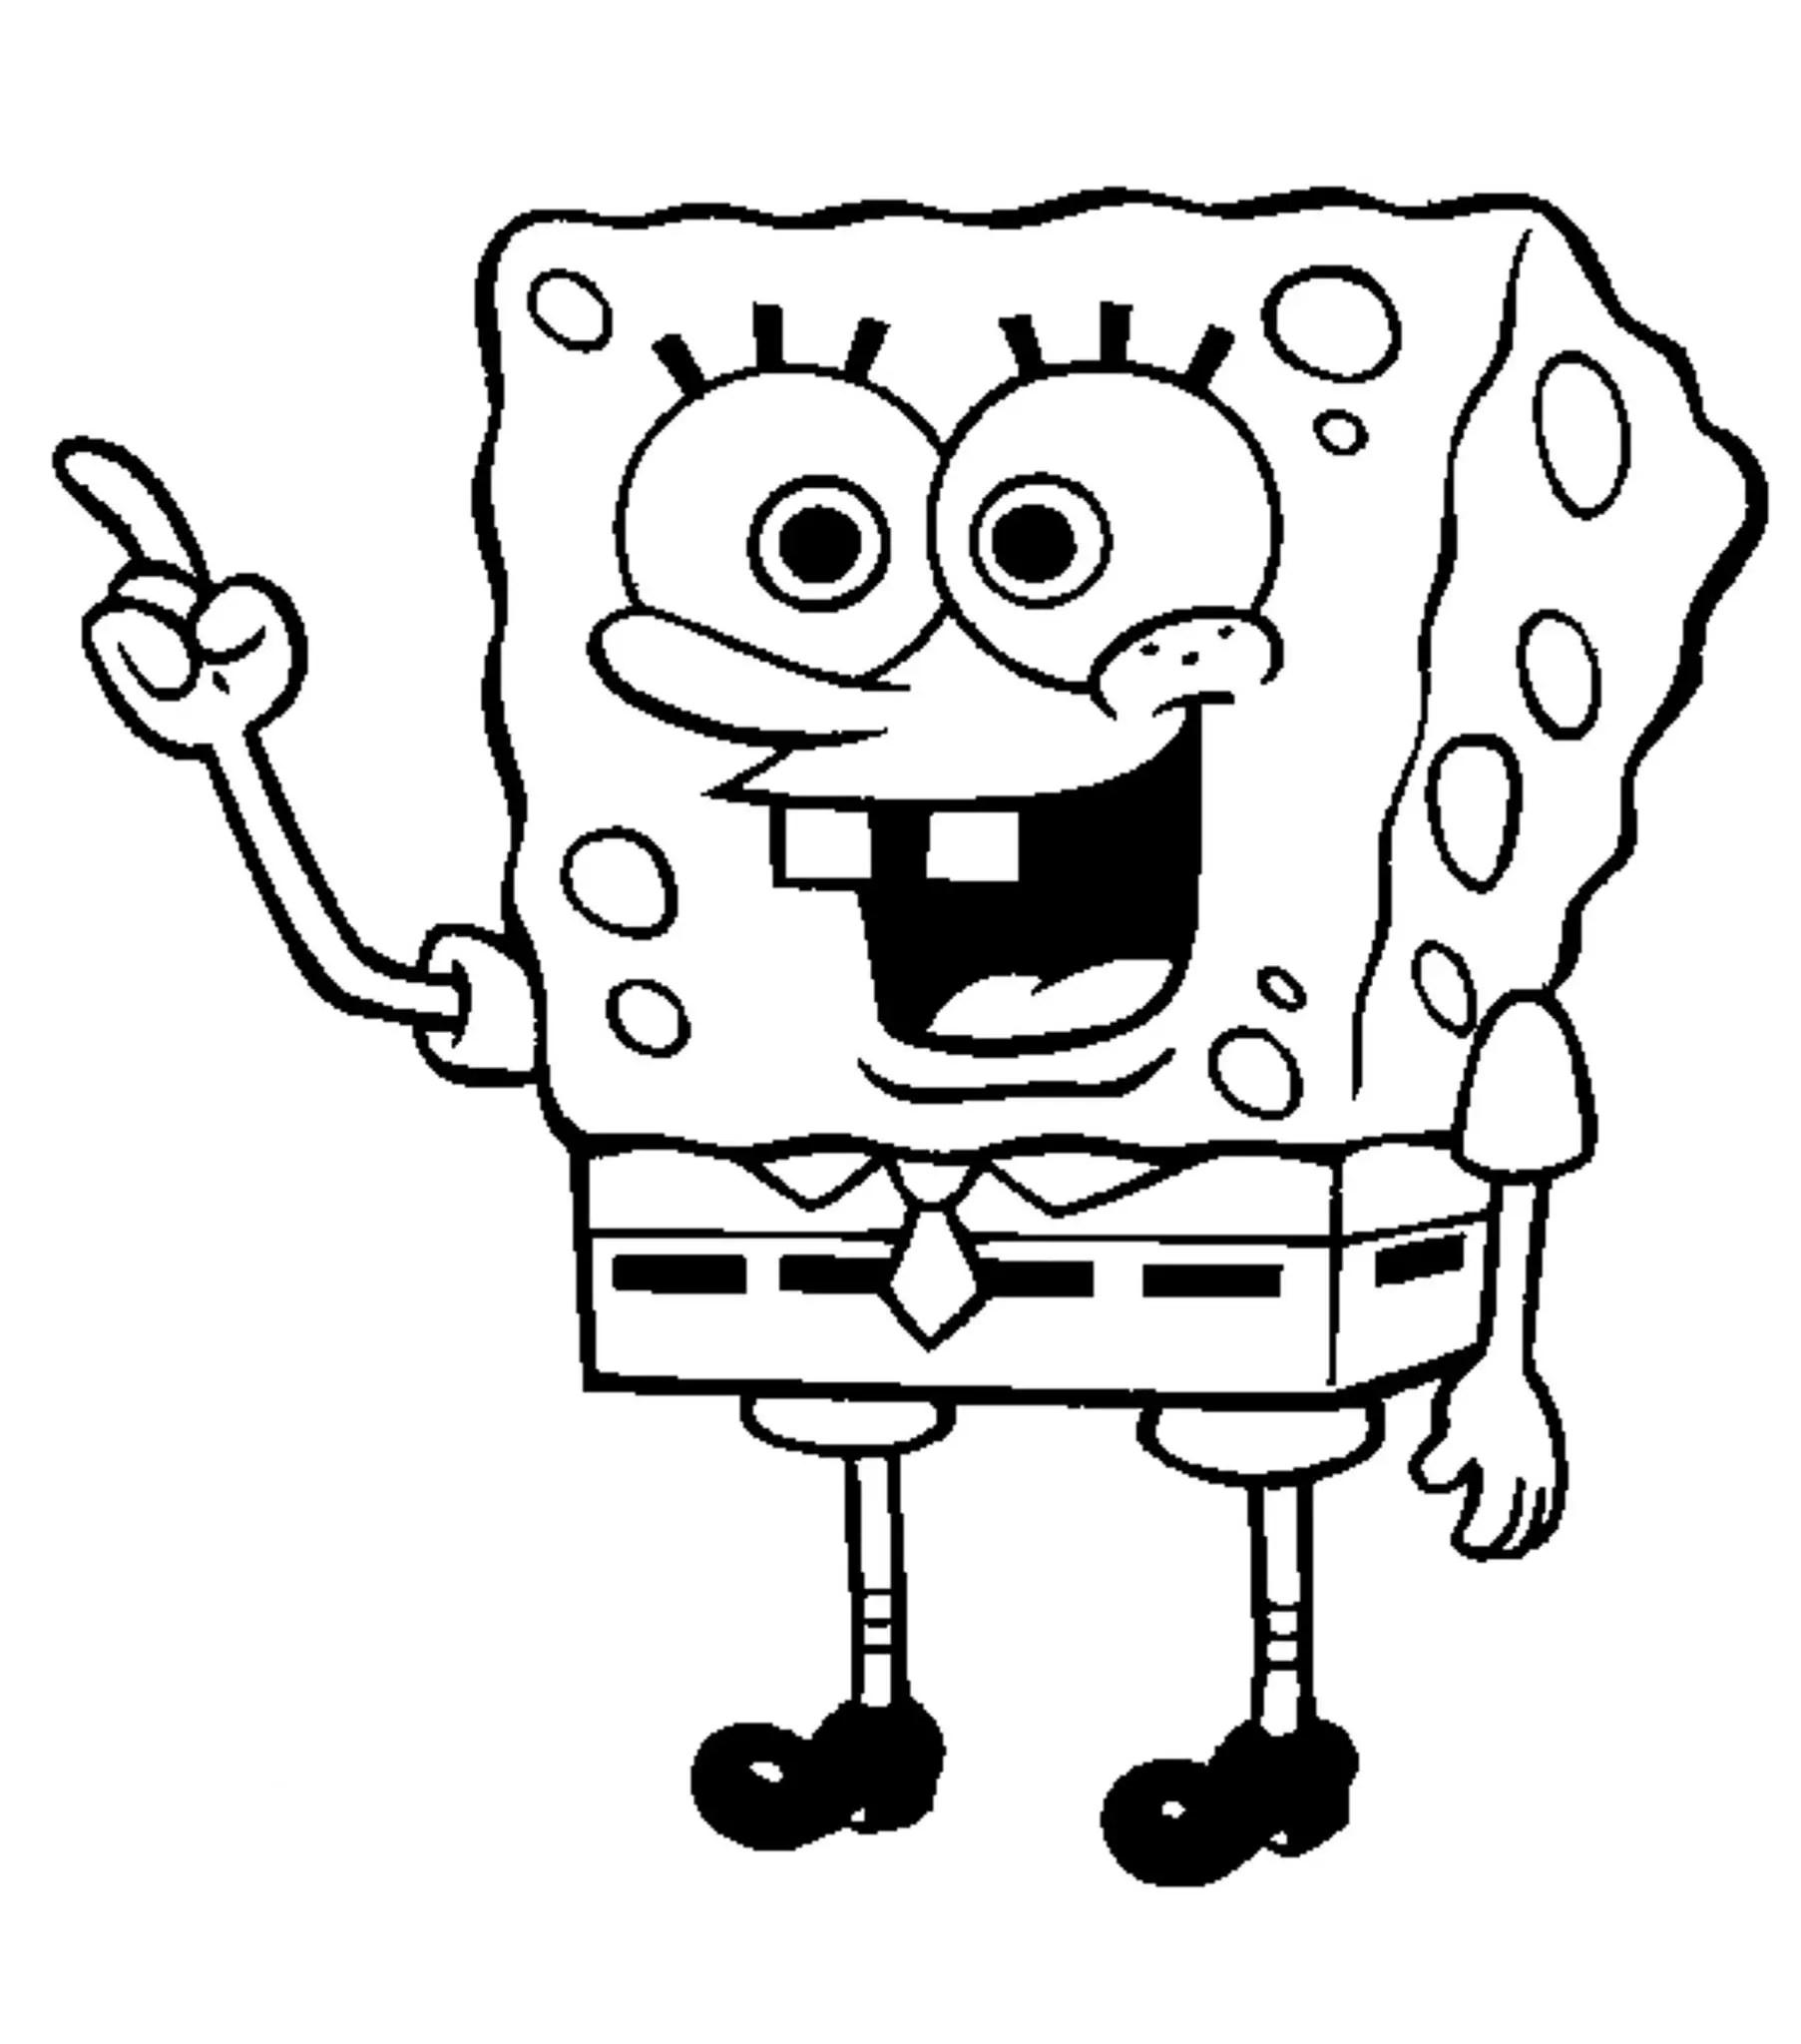 Print & Download   Choosing SpongeBob Coloring Pages For ...